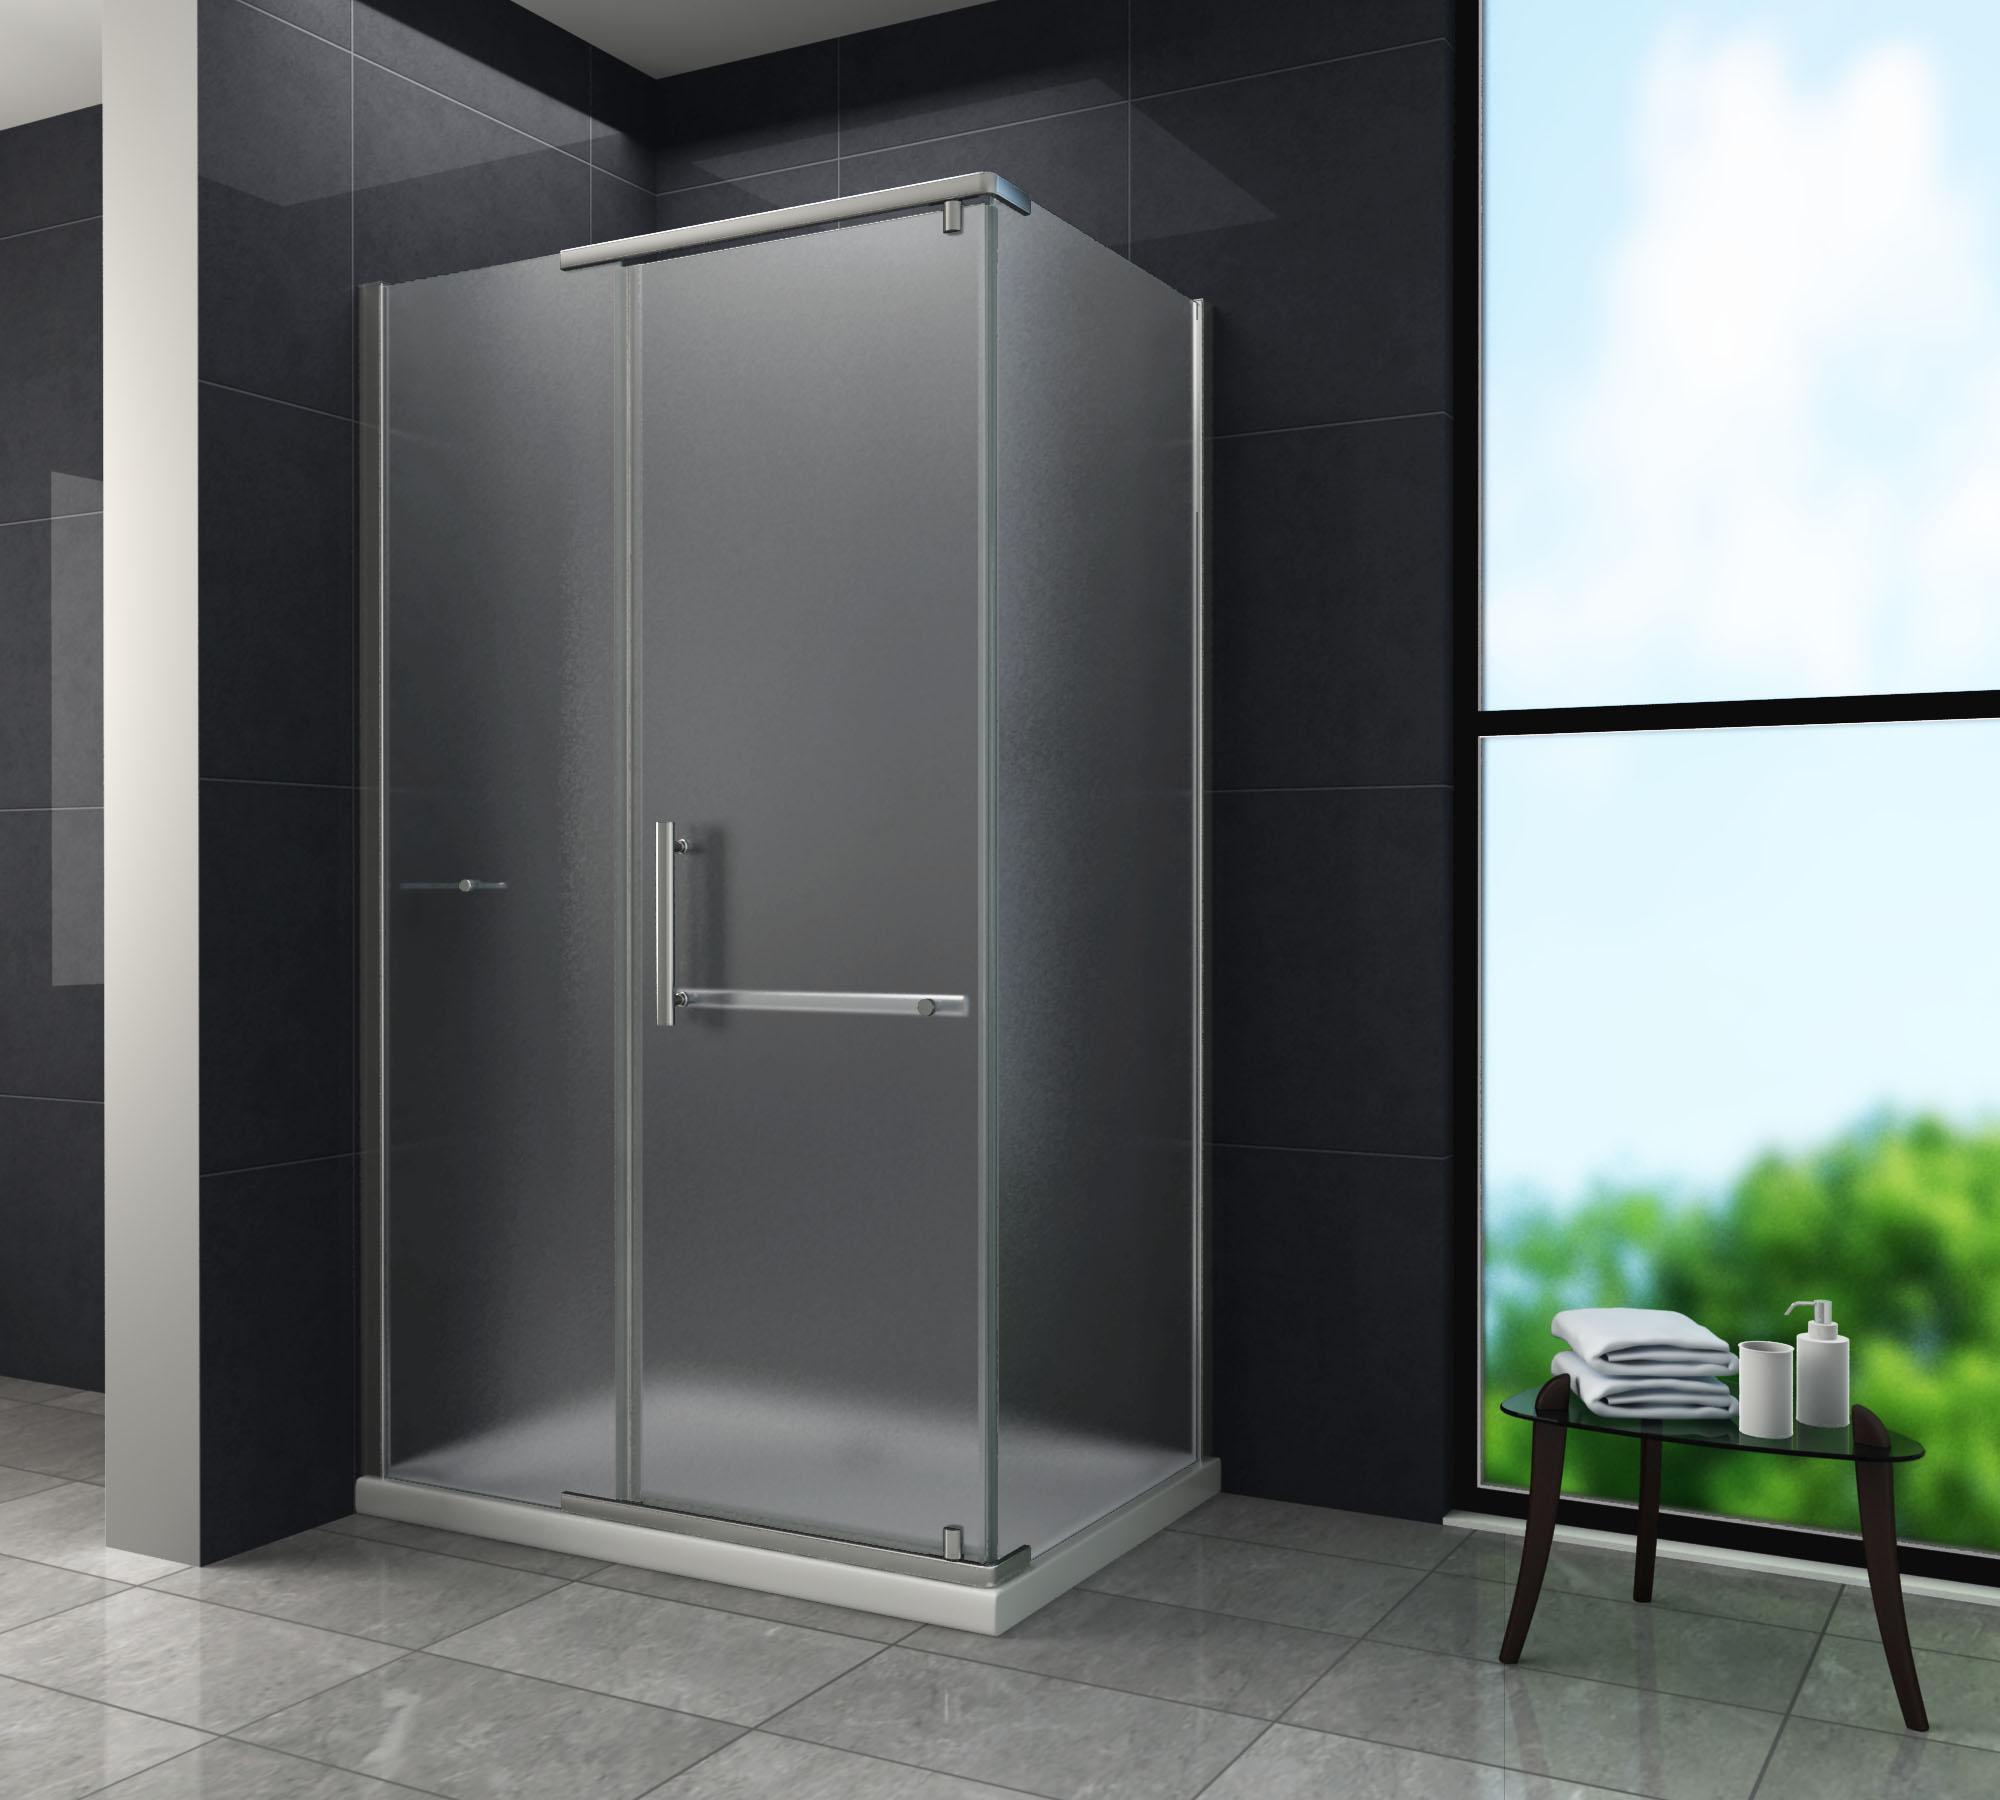 duschkabine cerra frost 100 x 80 x 195 cm ohne duschtasse glasdeals. Black Bedroom Furniture Sets. Home Design Ideas